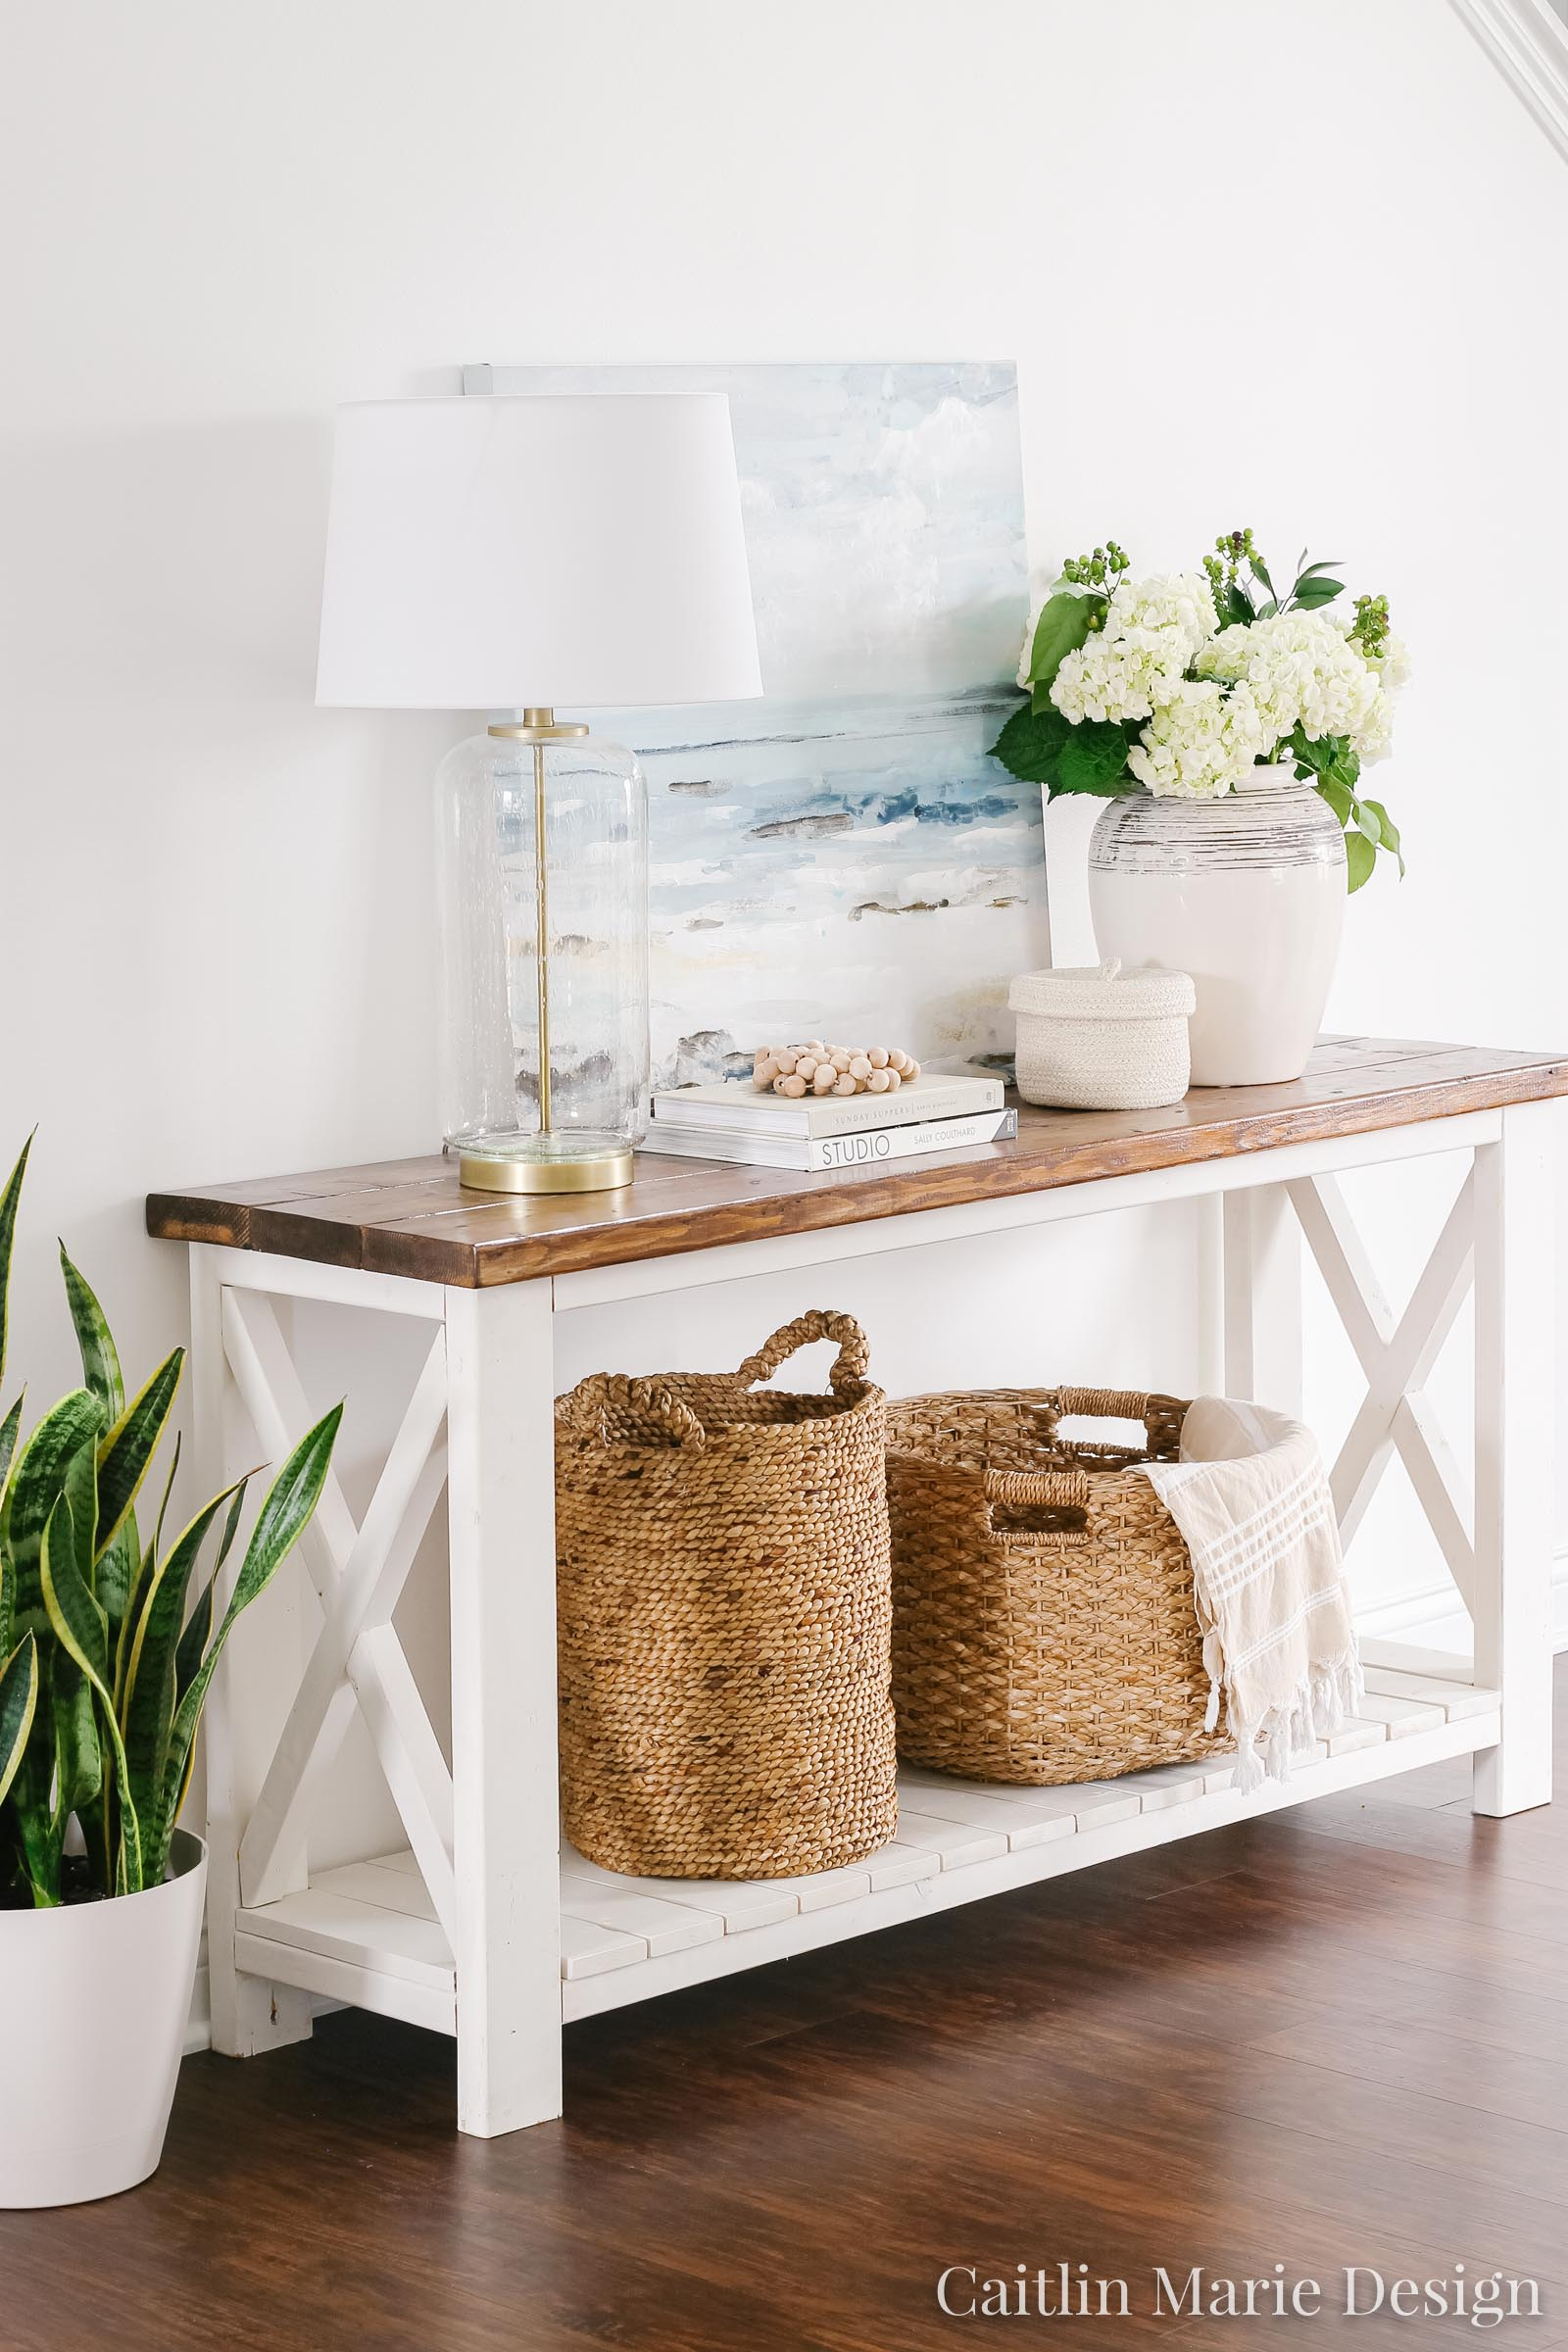 Summer Home Tour 2019 | coastal entryway decor, pottery vase, white hydrangeas, bead garland, rattan baskets, ocean painting